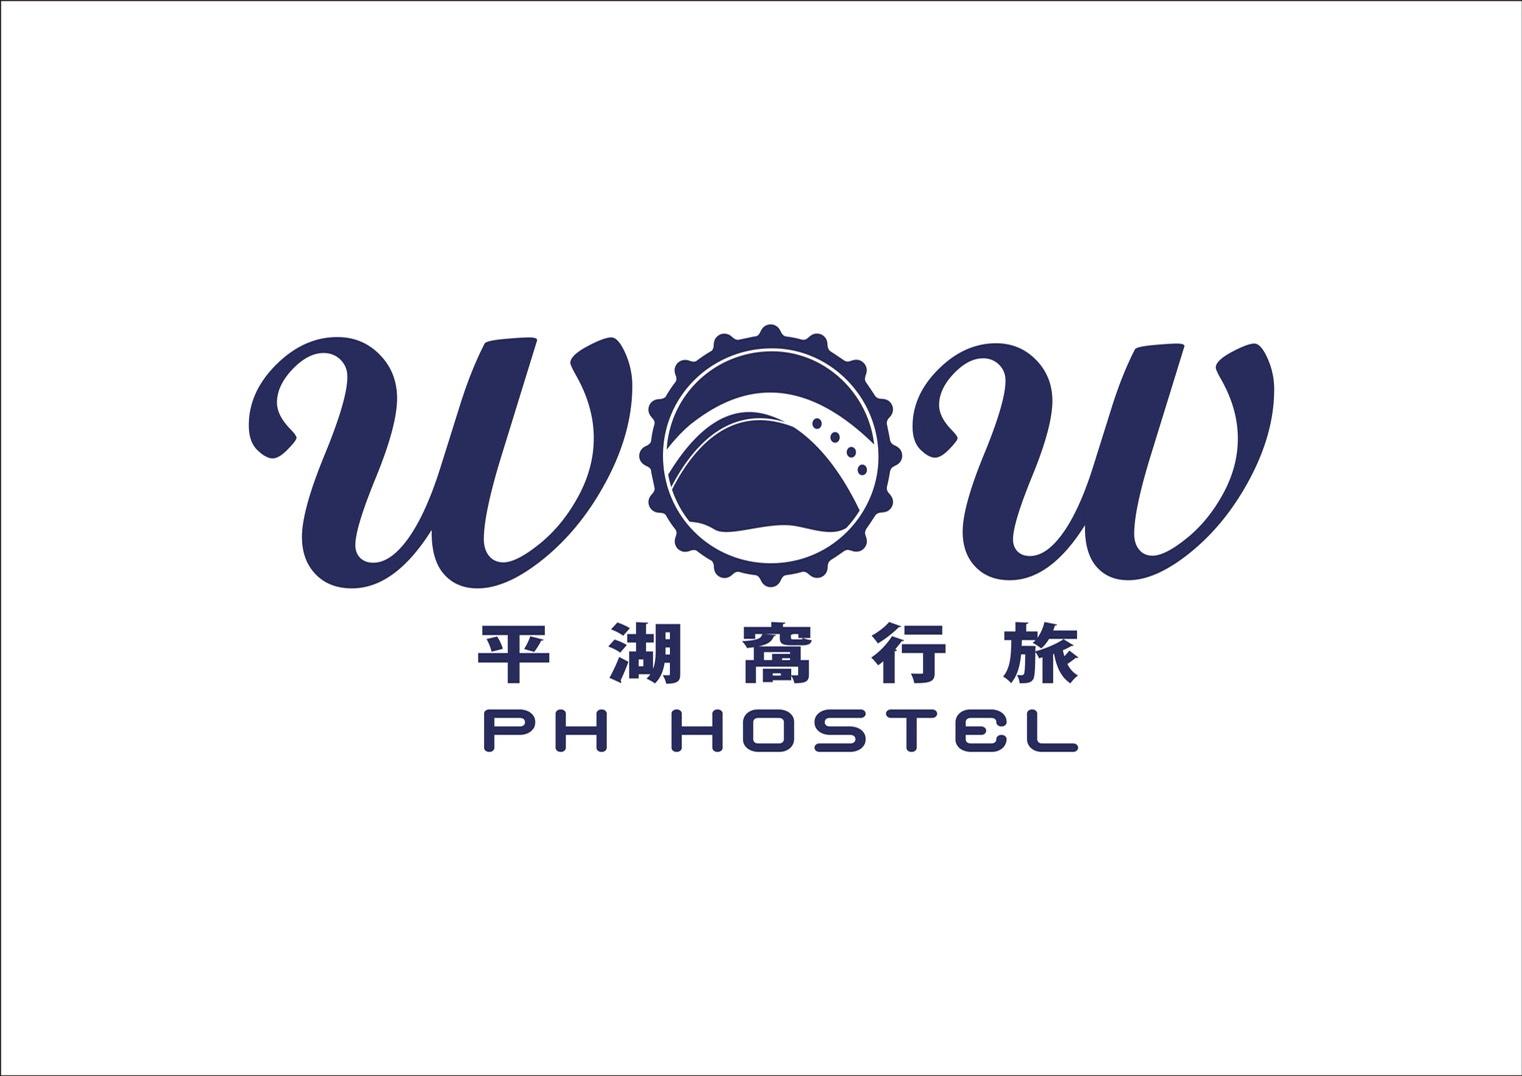 PH Hostel